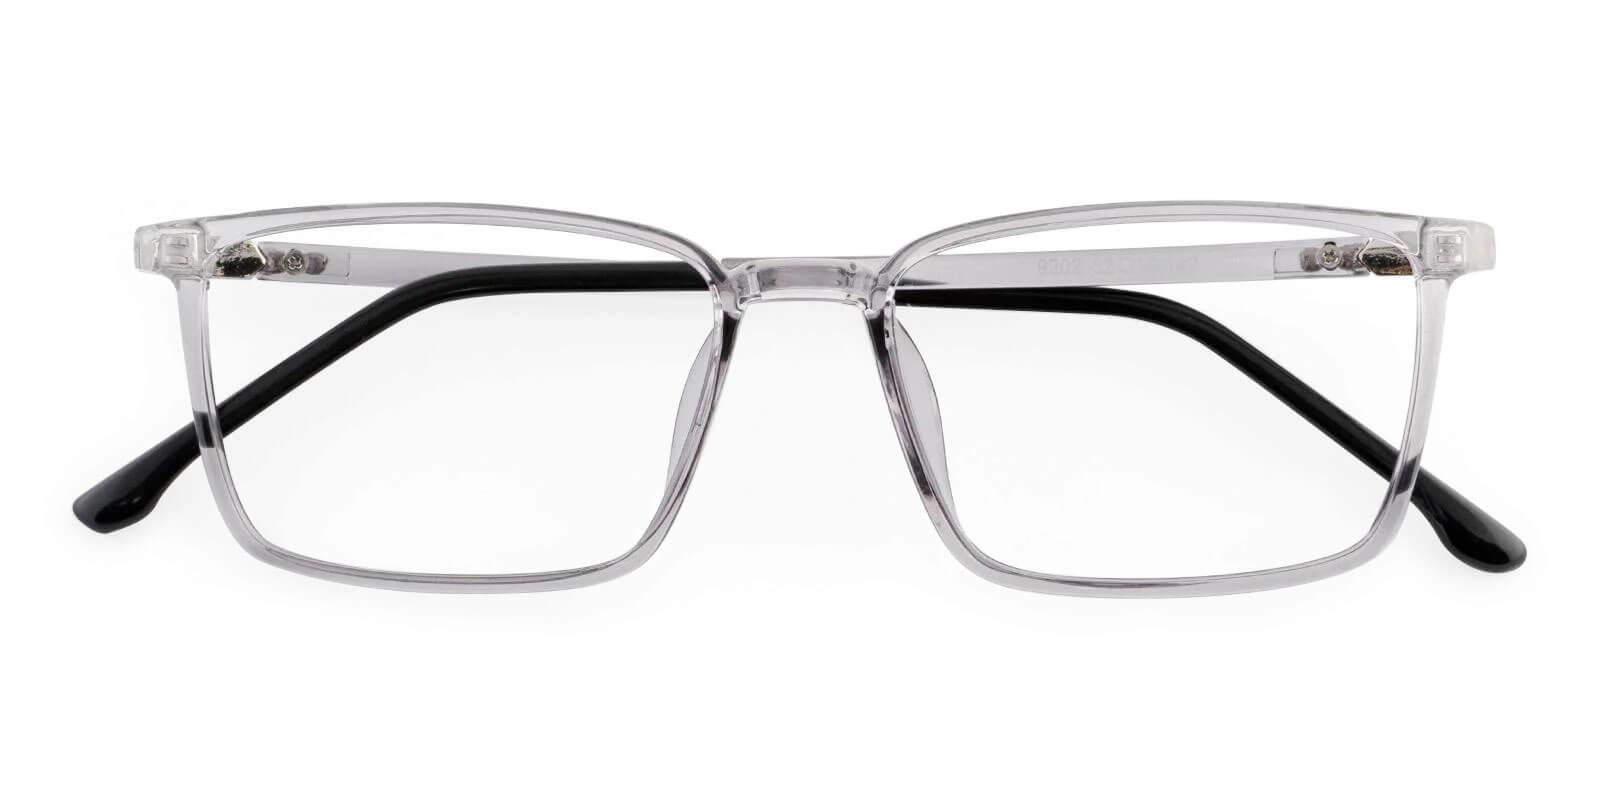 Syria Gray TR Eyeglasses , UniversalBridgeFit Frames from ABBE Glasses